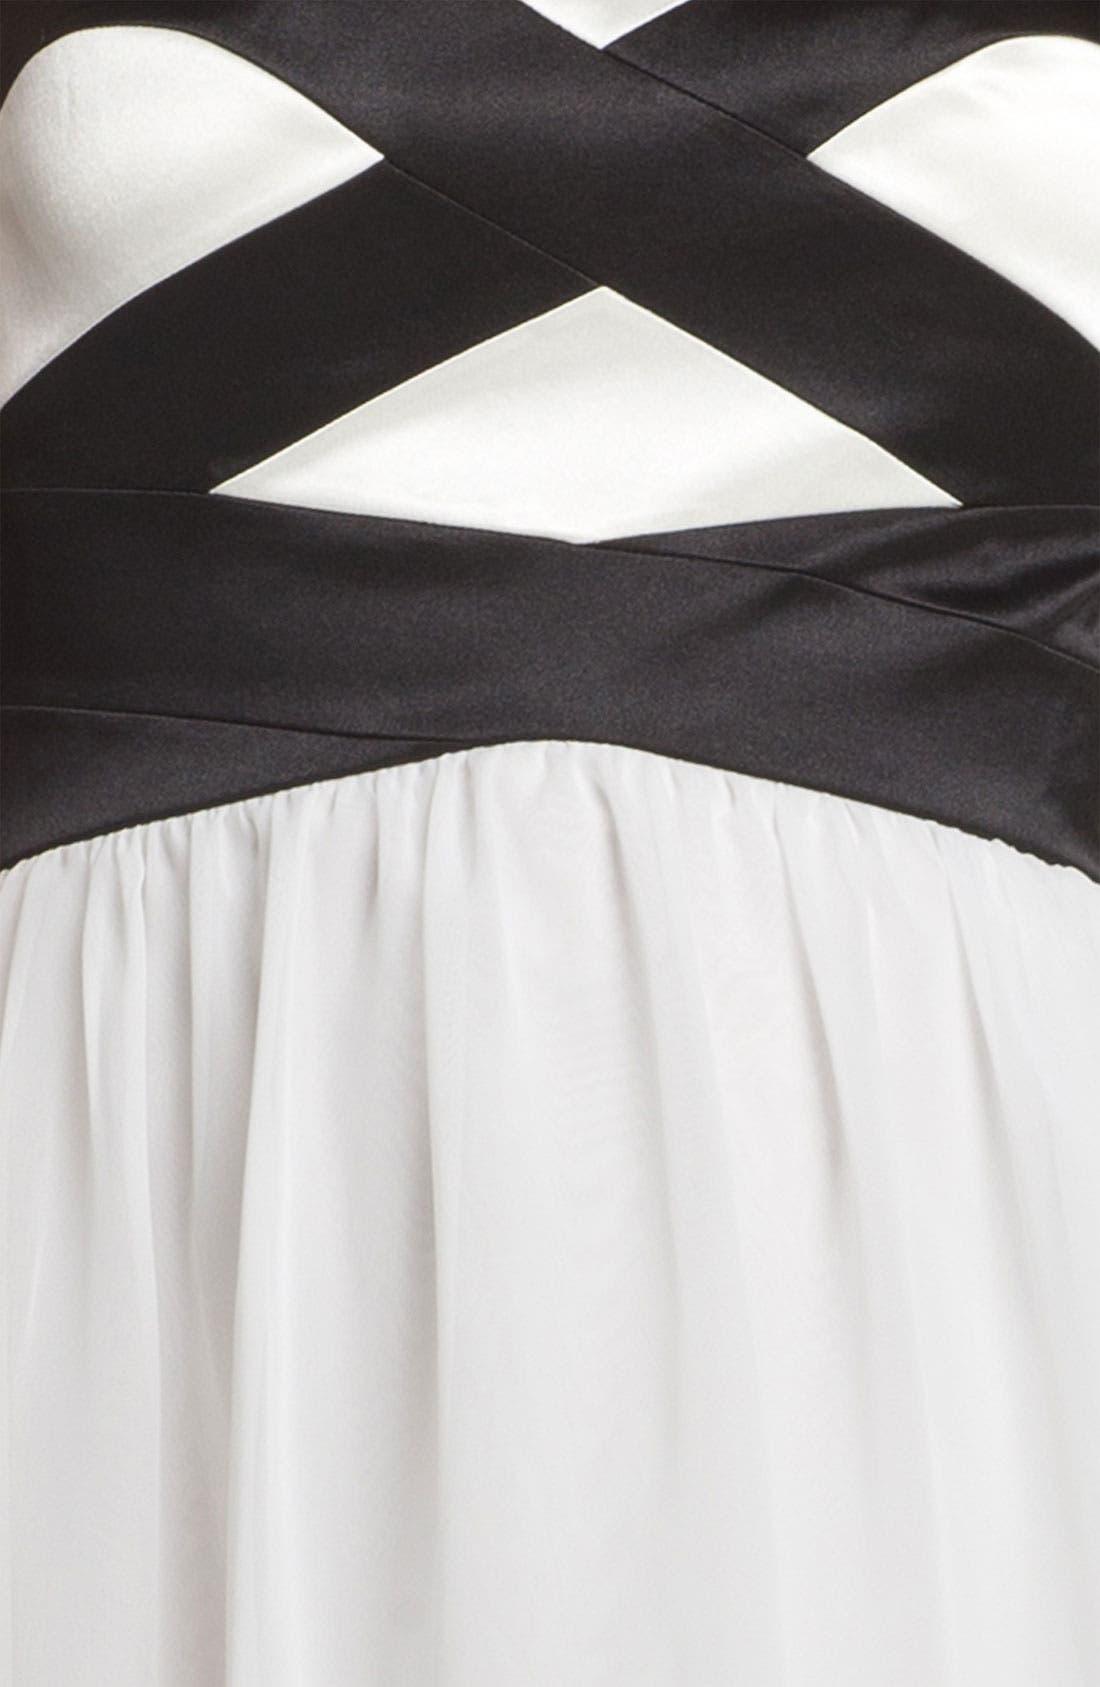 Alternate Image 3  - Hailey Logan Sweetheart Chiffon Dress (Juniors) (Online Only)